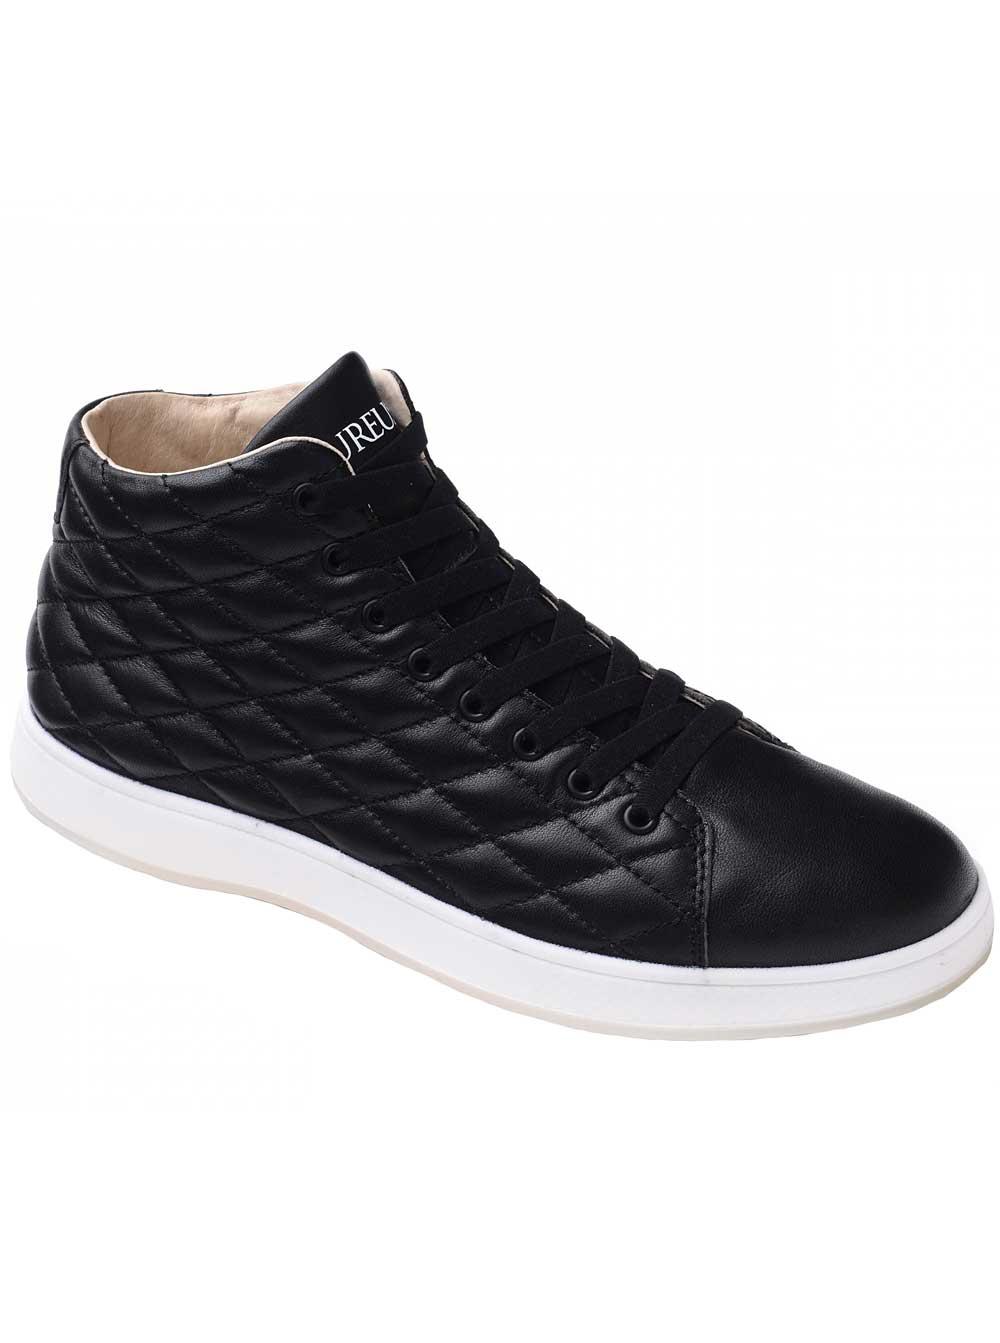 Aureus Men's Lux Black Sneakers 9 M US